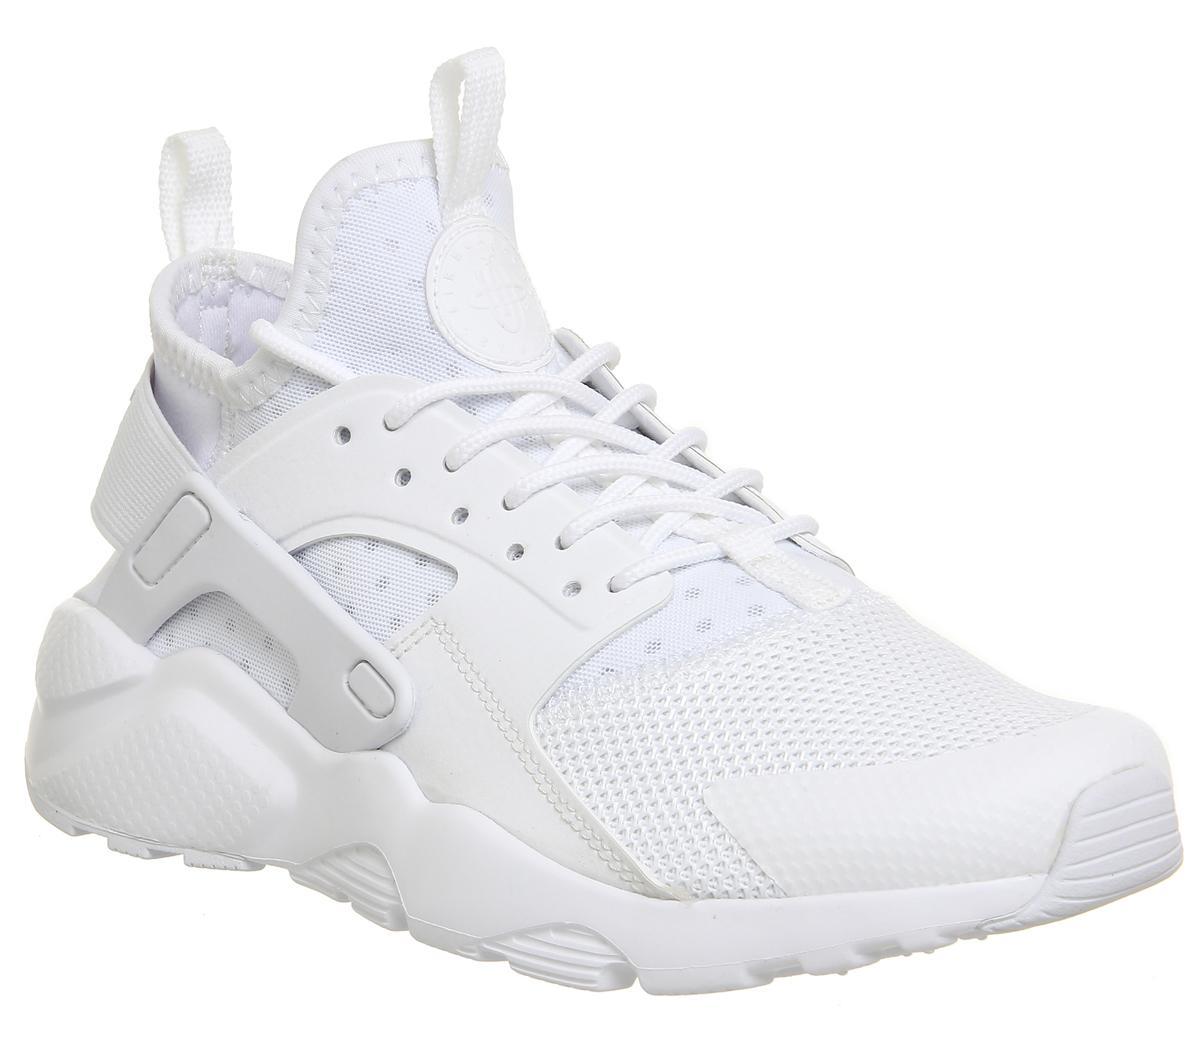 Nike Huarache Ultra Trainers White